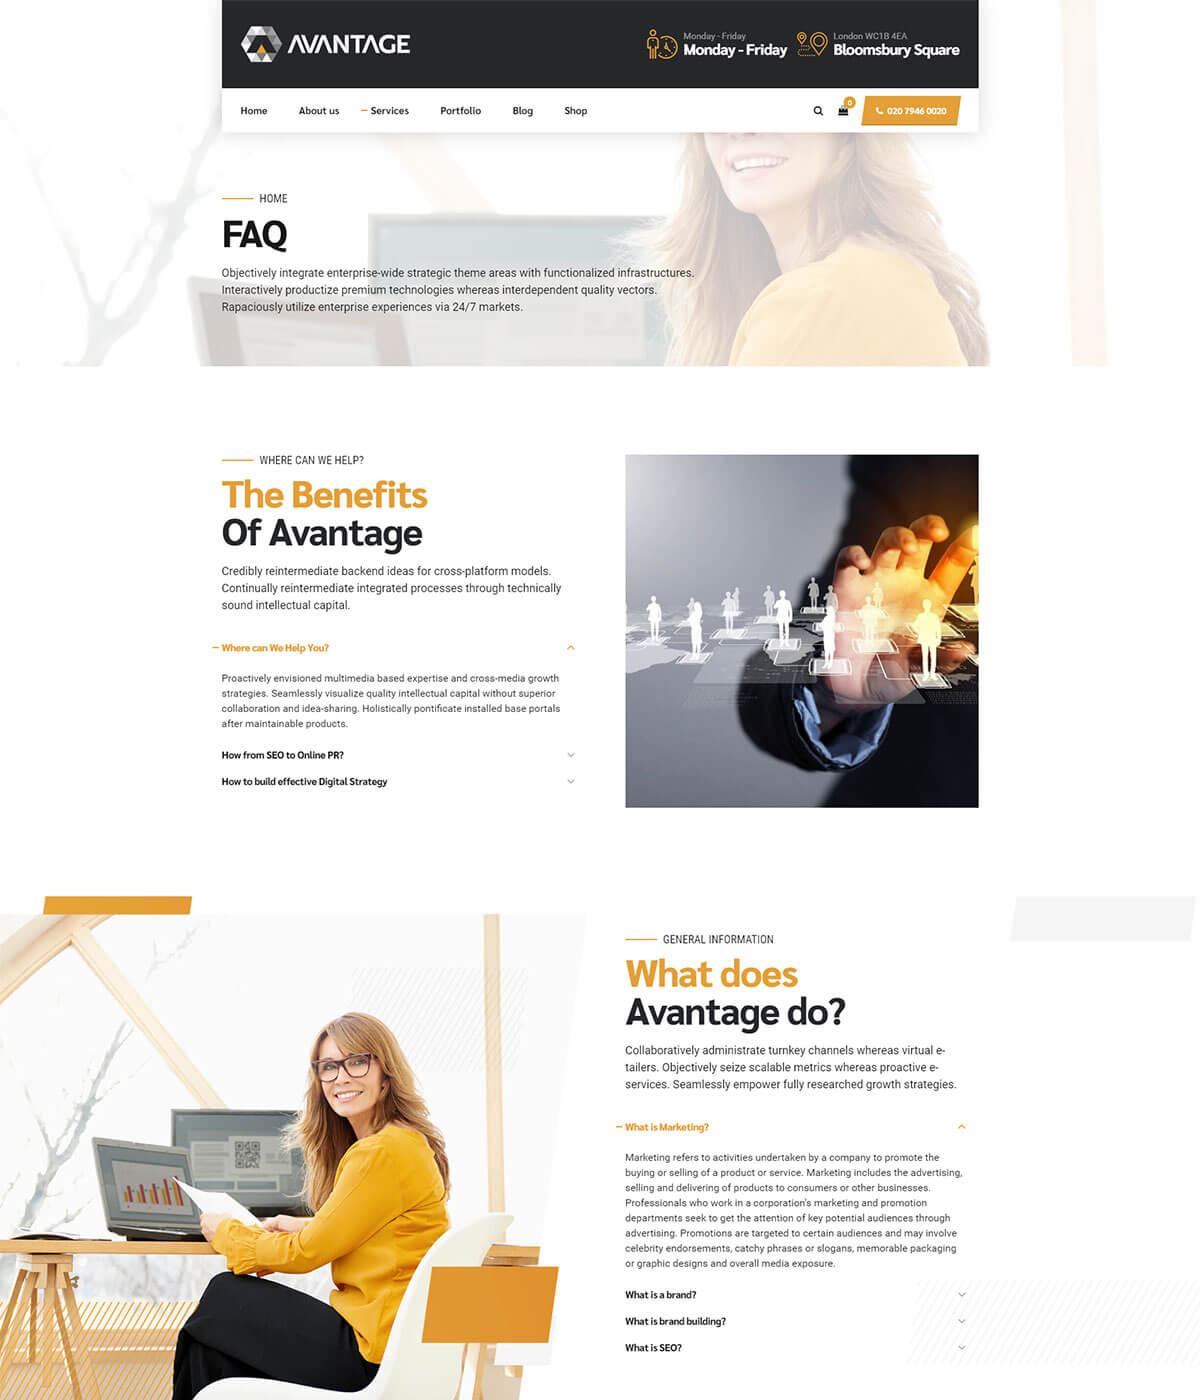 https://avantage.bold-themes.com/wp-content/uploads/2019/05/marketing-11-faq.jpg